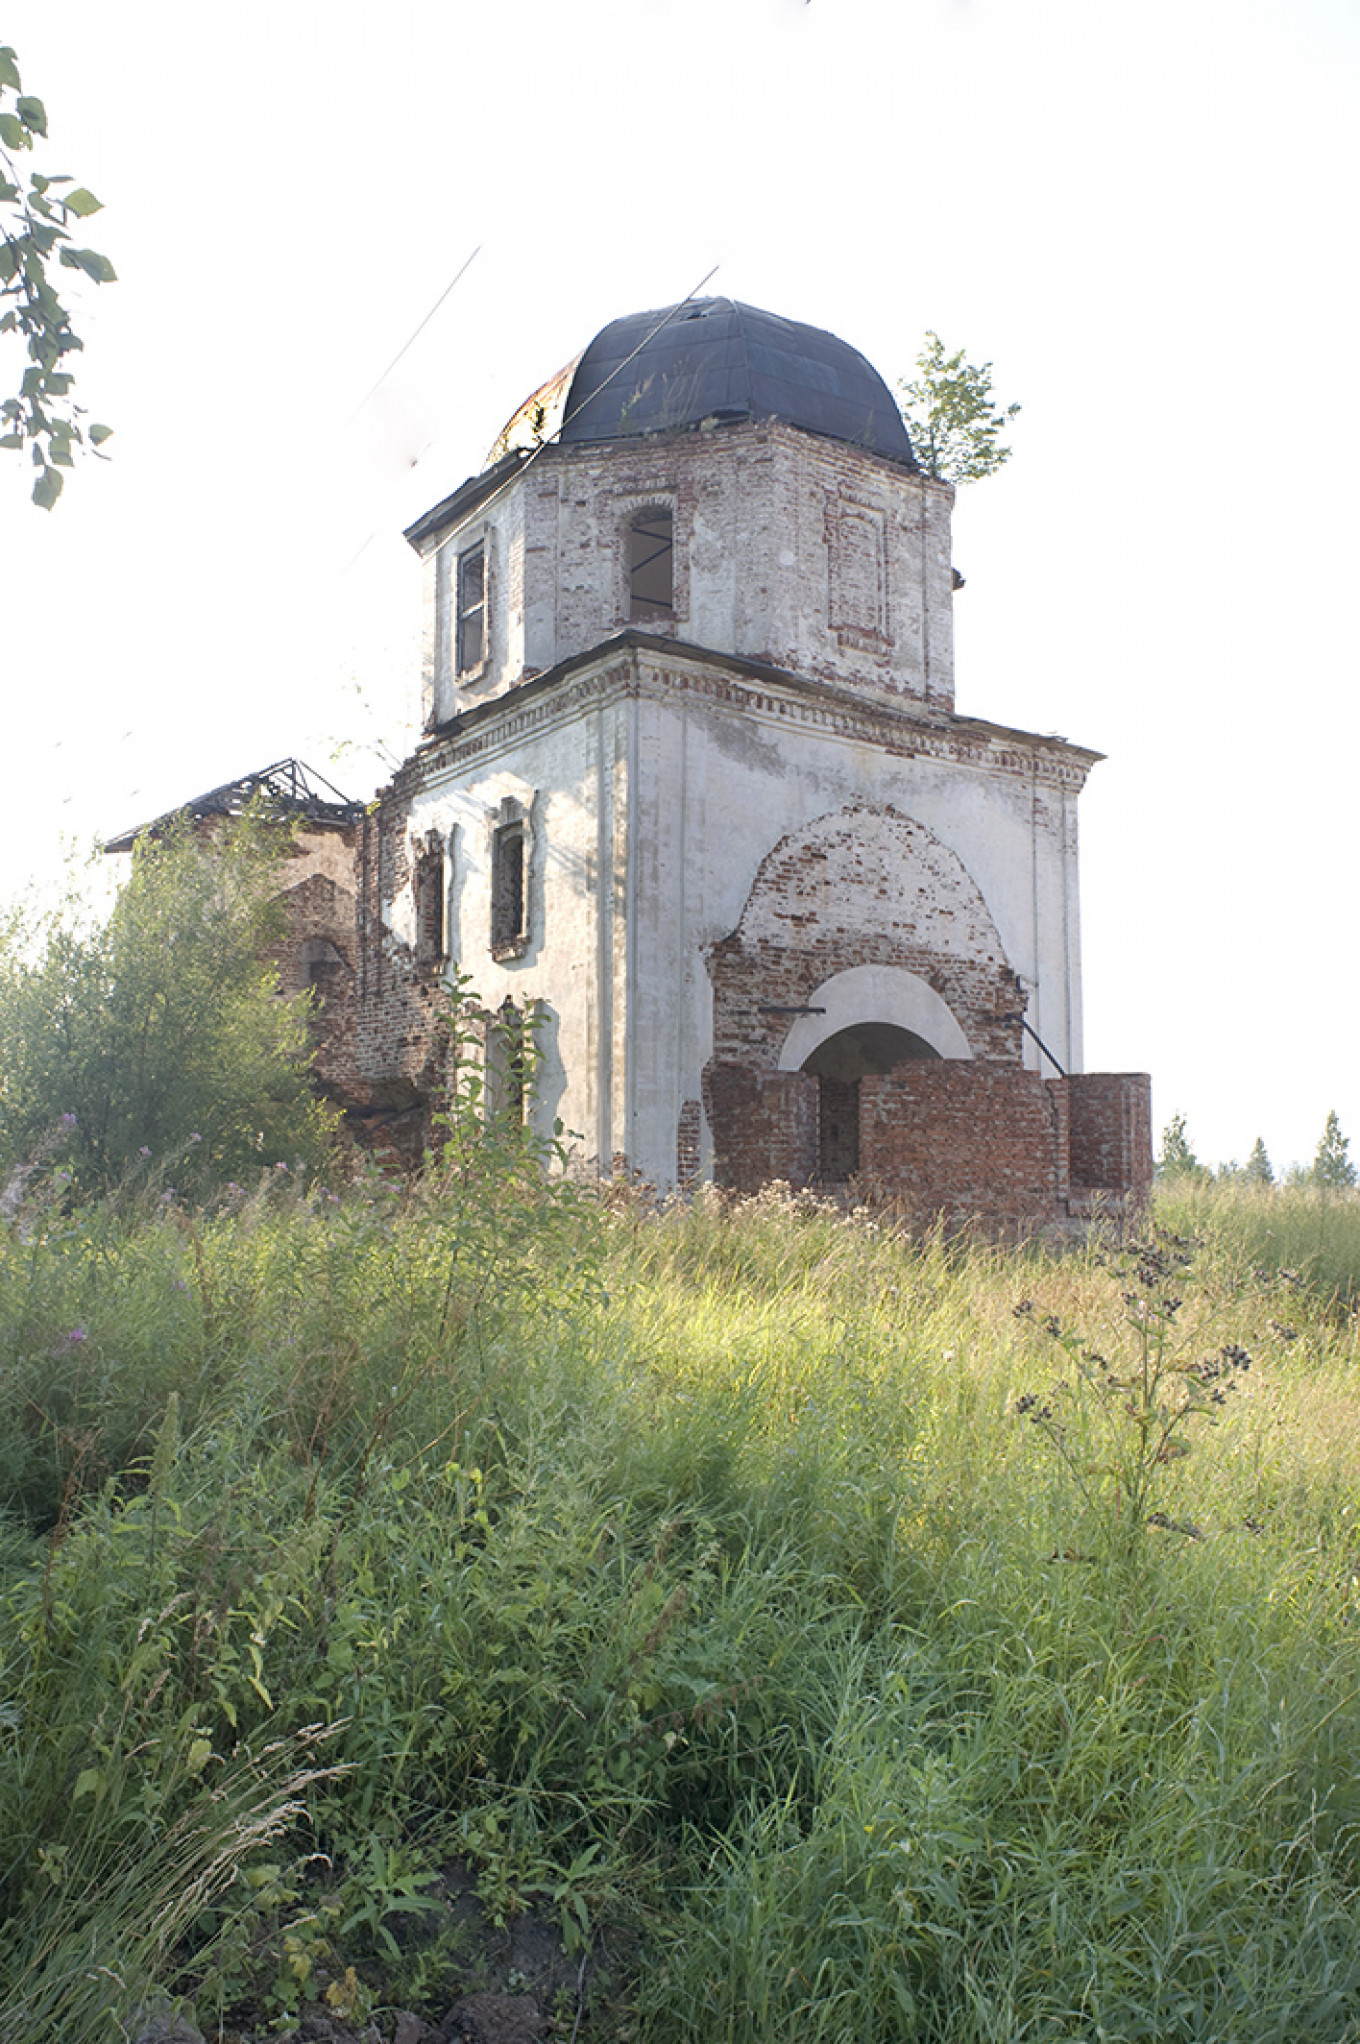 Church of St. Paraskeva, July 2010. WC Brumfield/Duke University Press